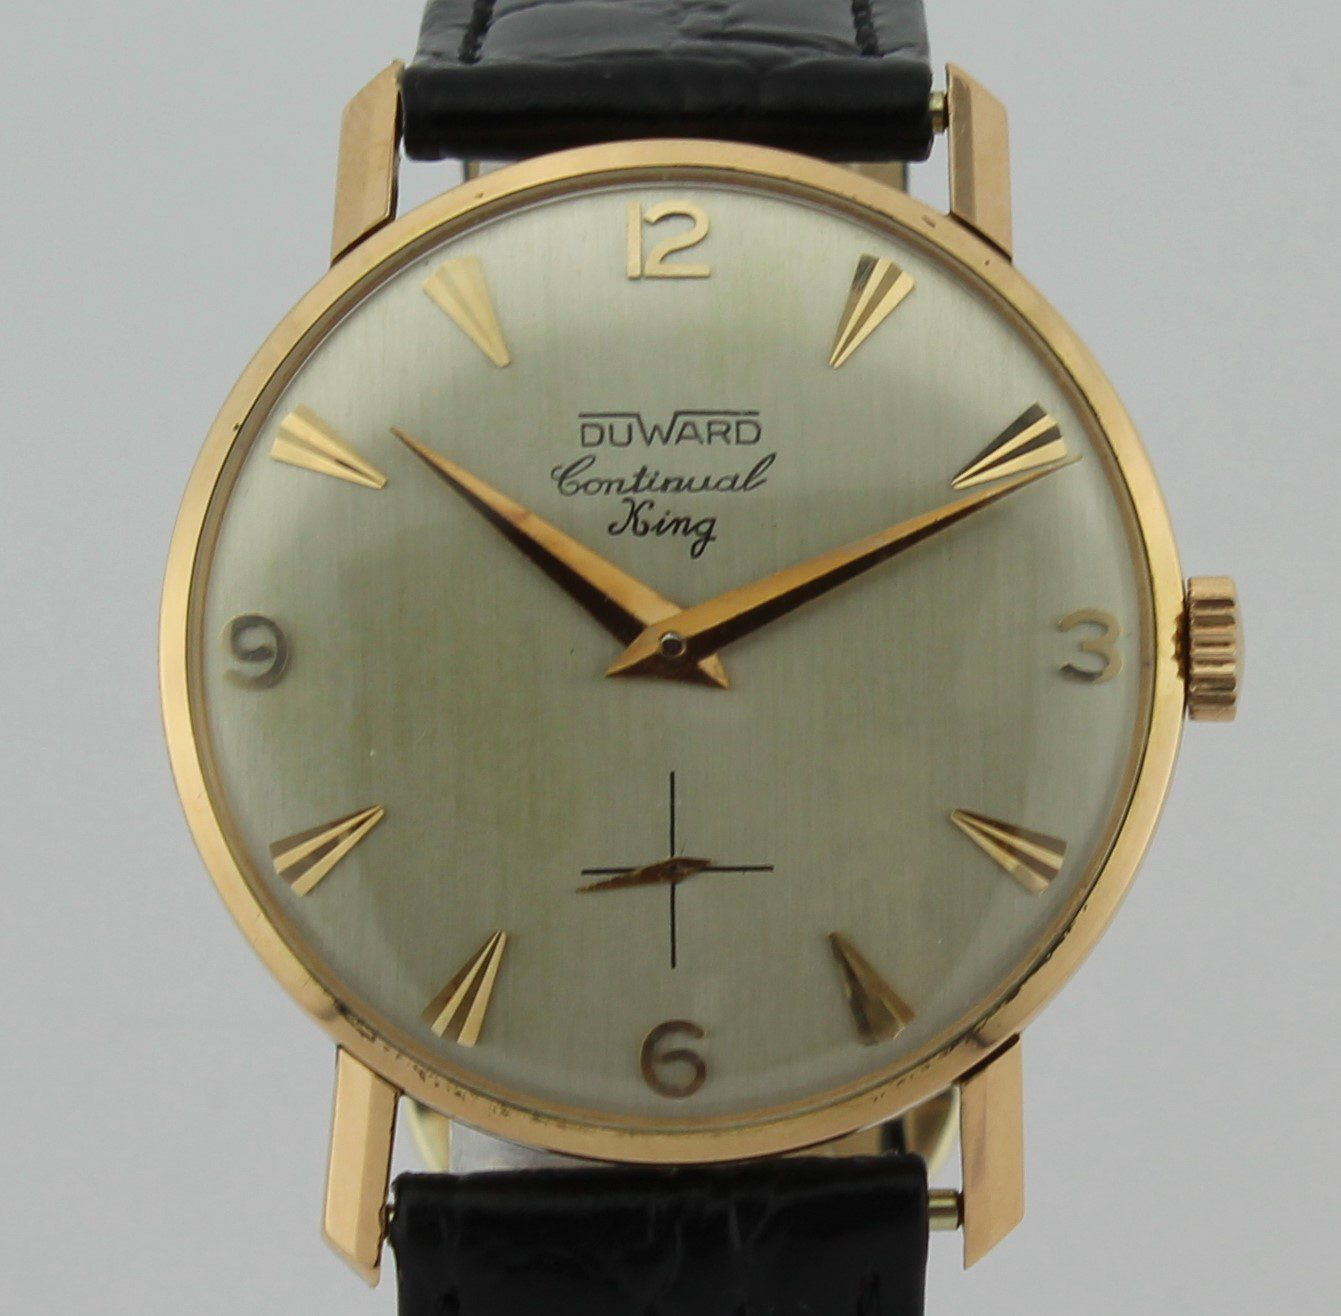 6241487e3841 Duward Continental King Vintage 18K Gold - Corello